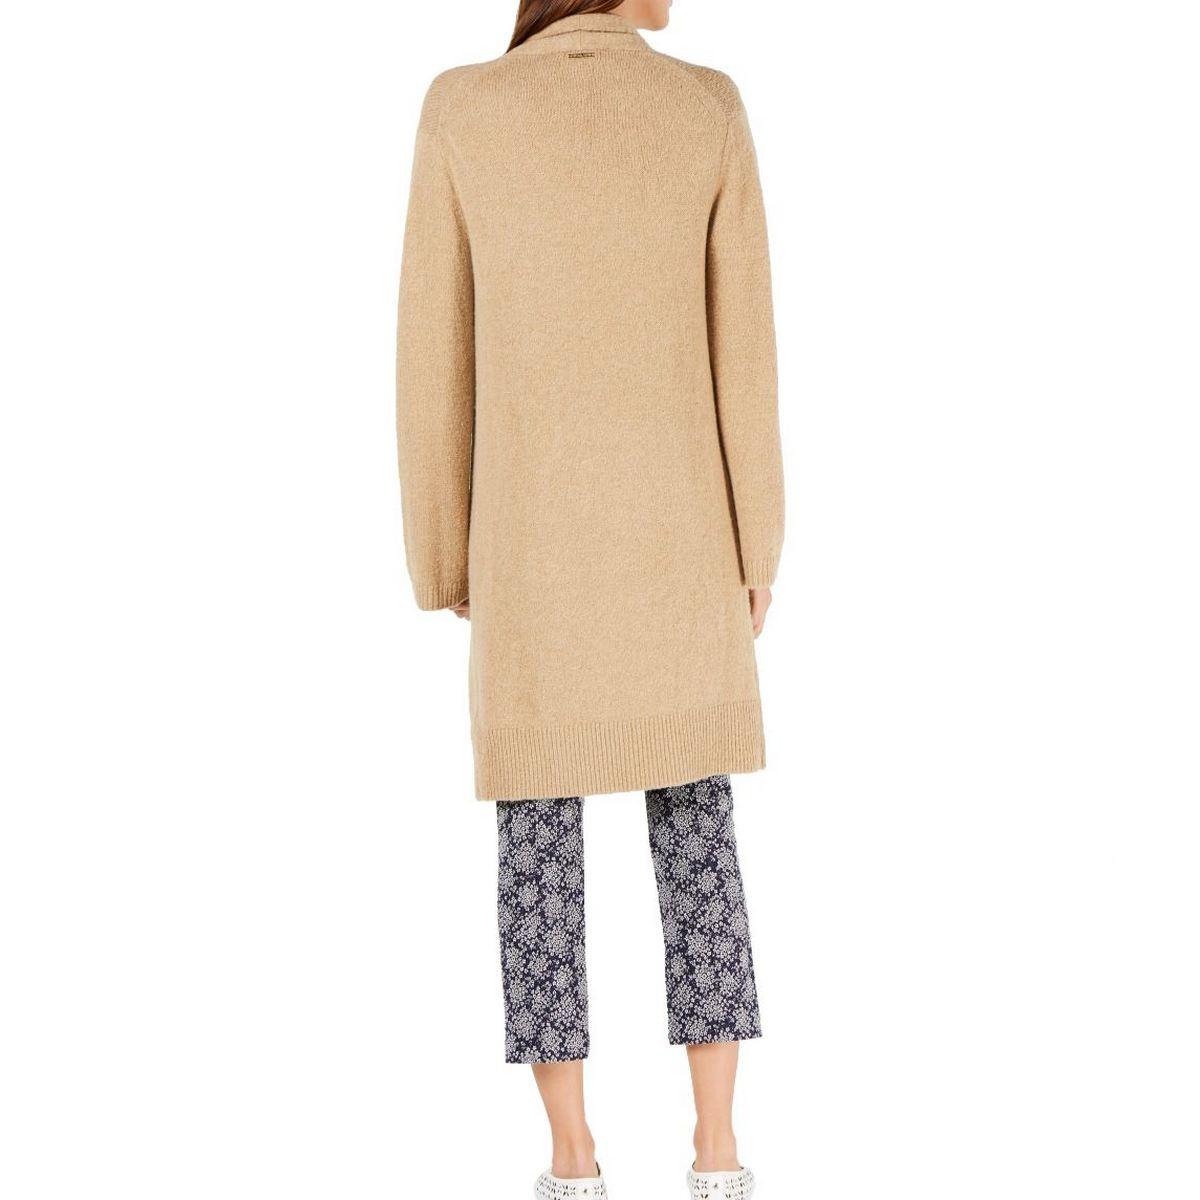 MICHAEL-KORS-Women-039-s-Wool-Blend-Open-front-Long-Cardigan-Sweater-Top-TEDO thumbnail 6